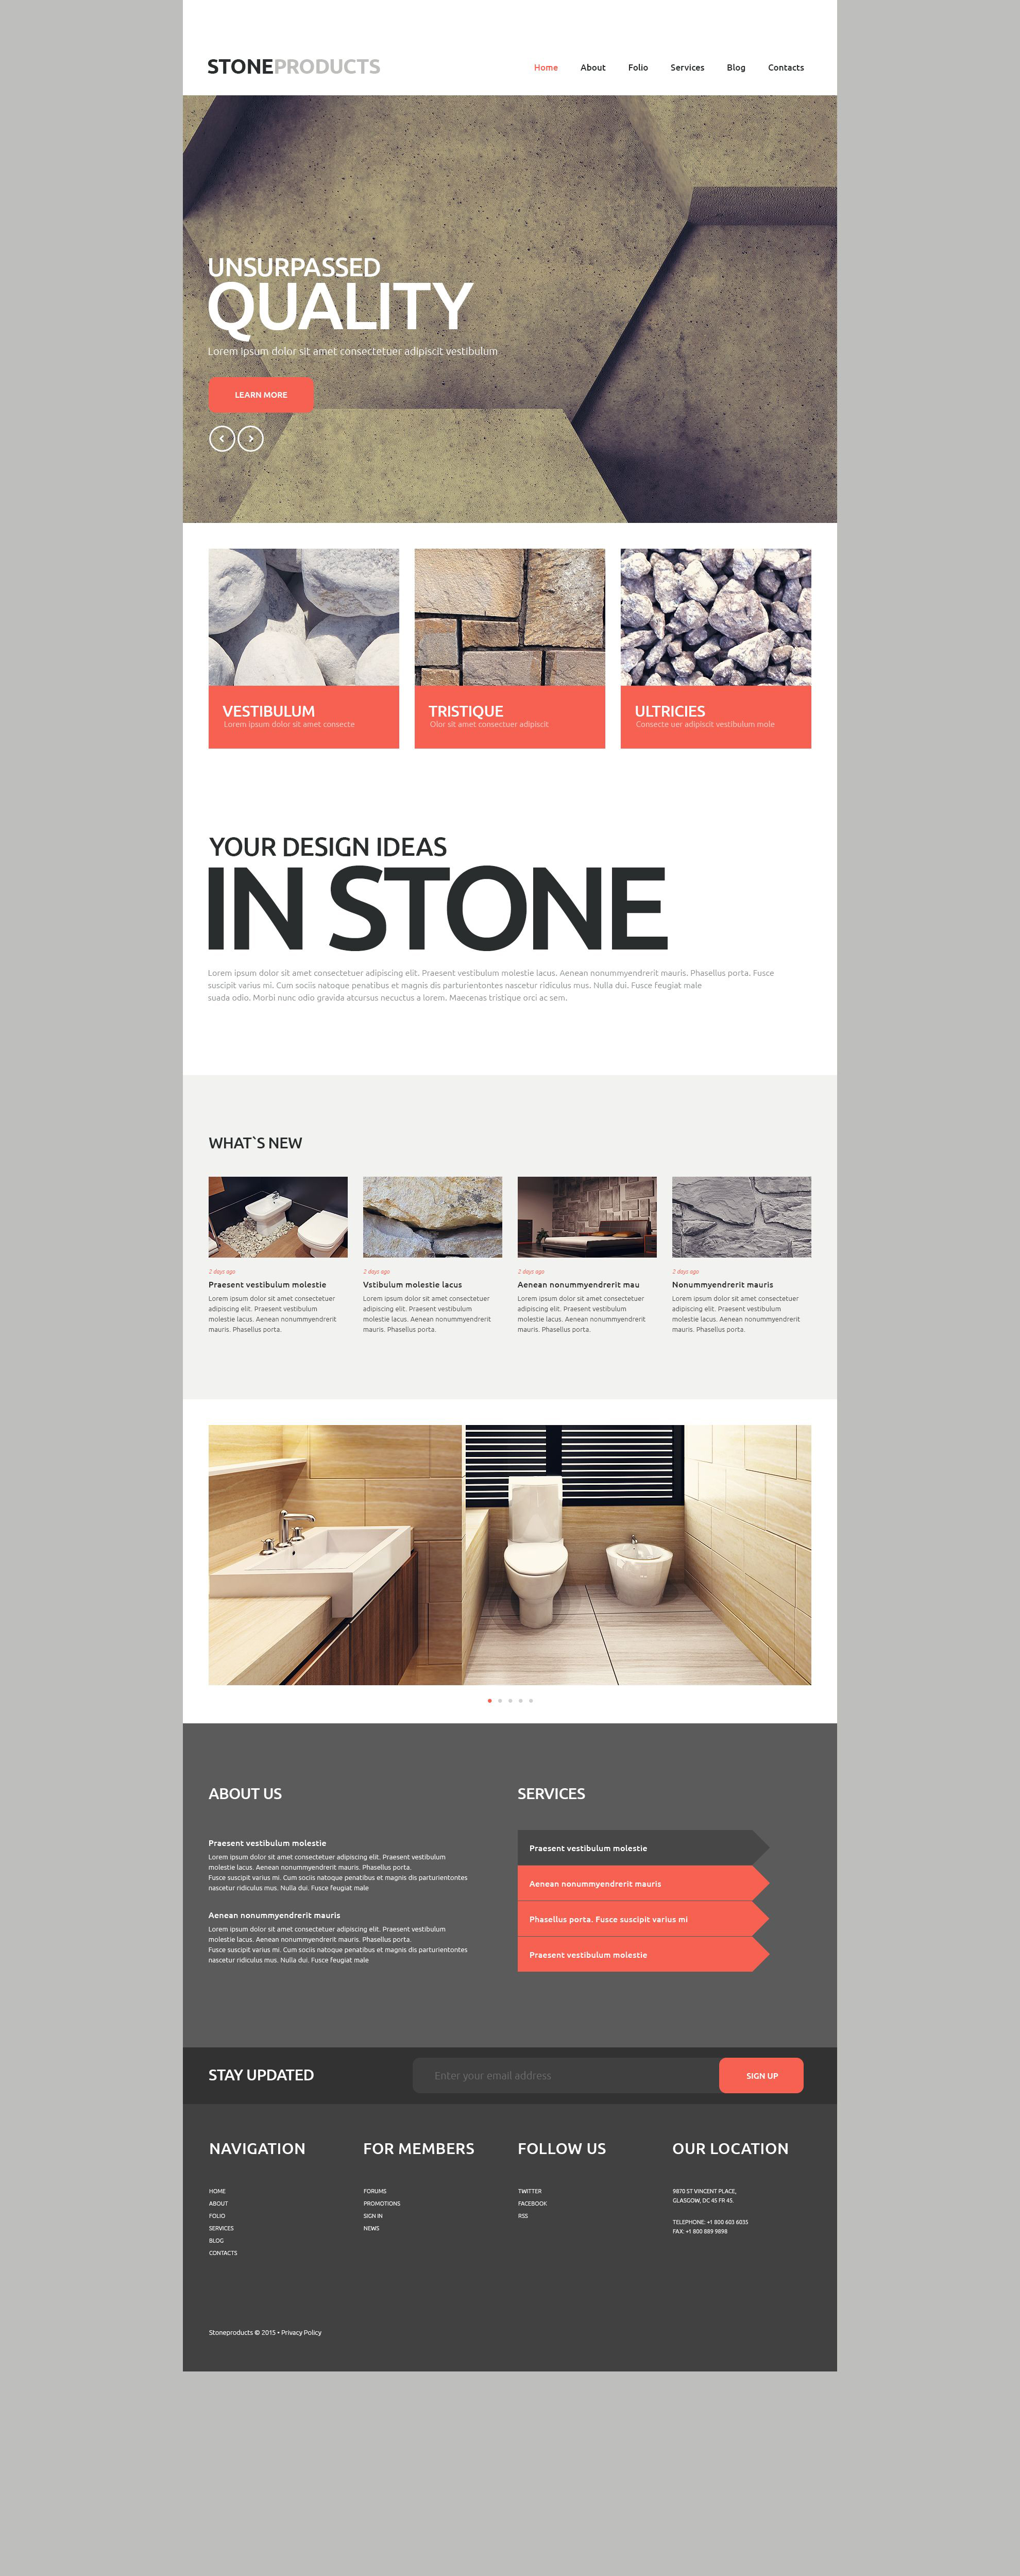 Flooring Products №53751 - скриншот